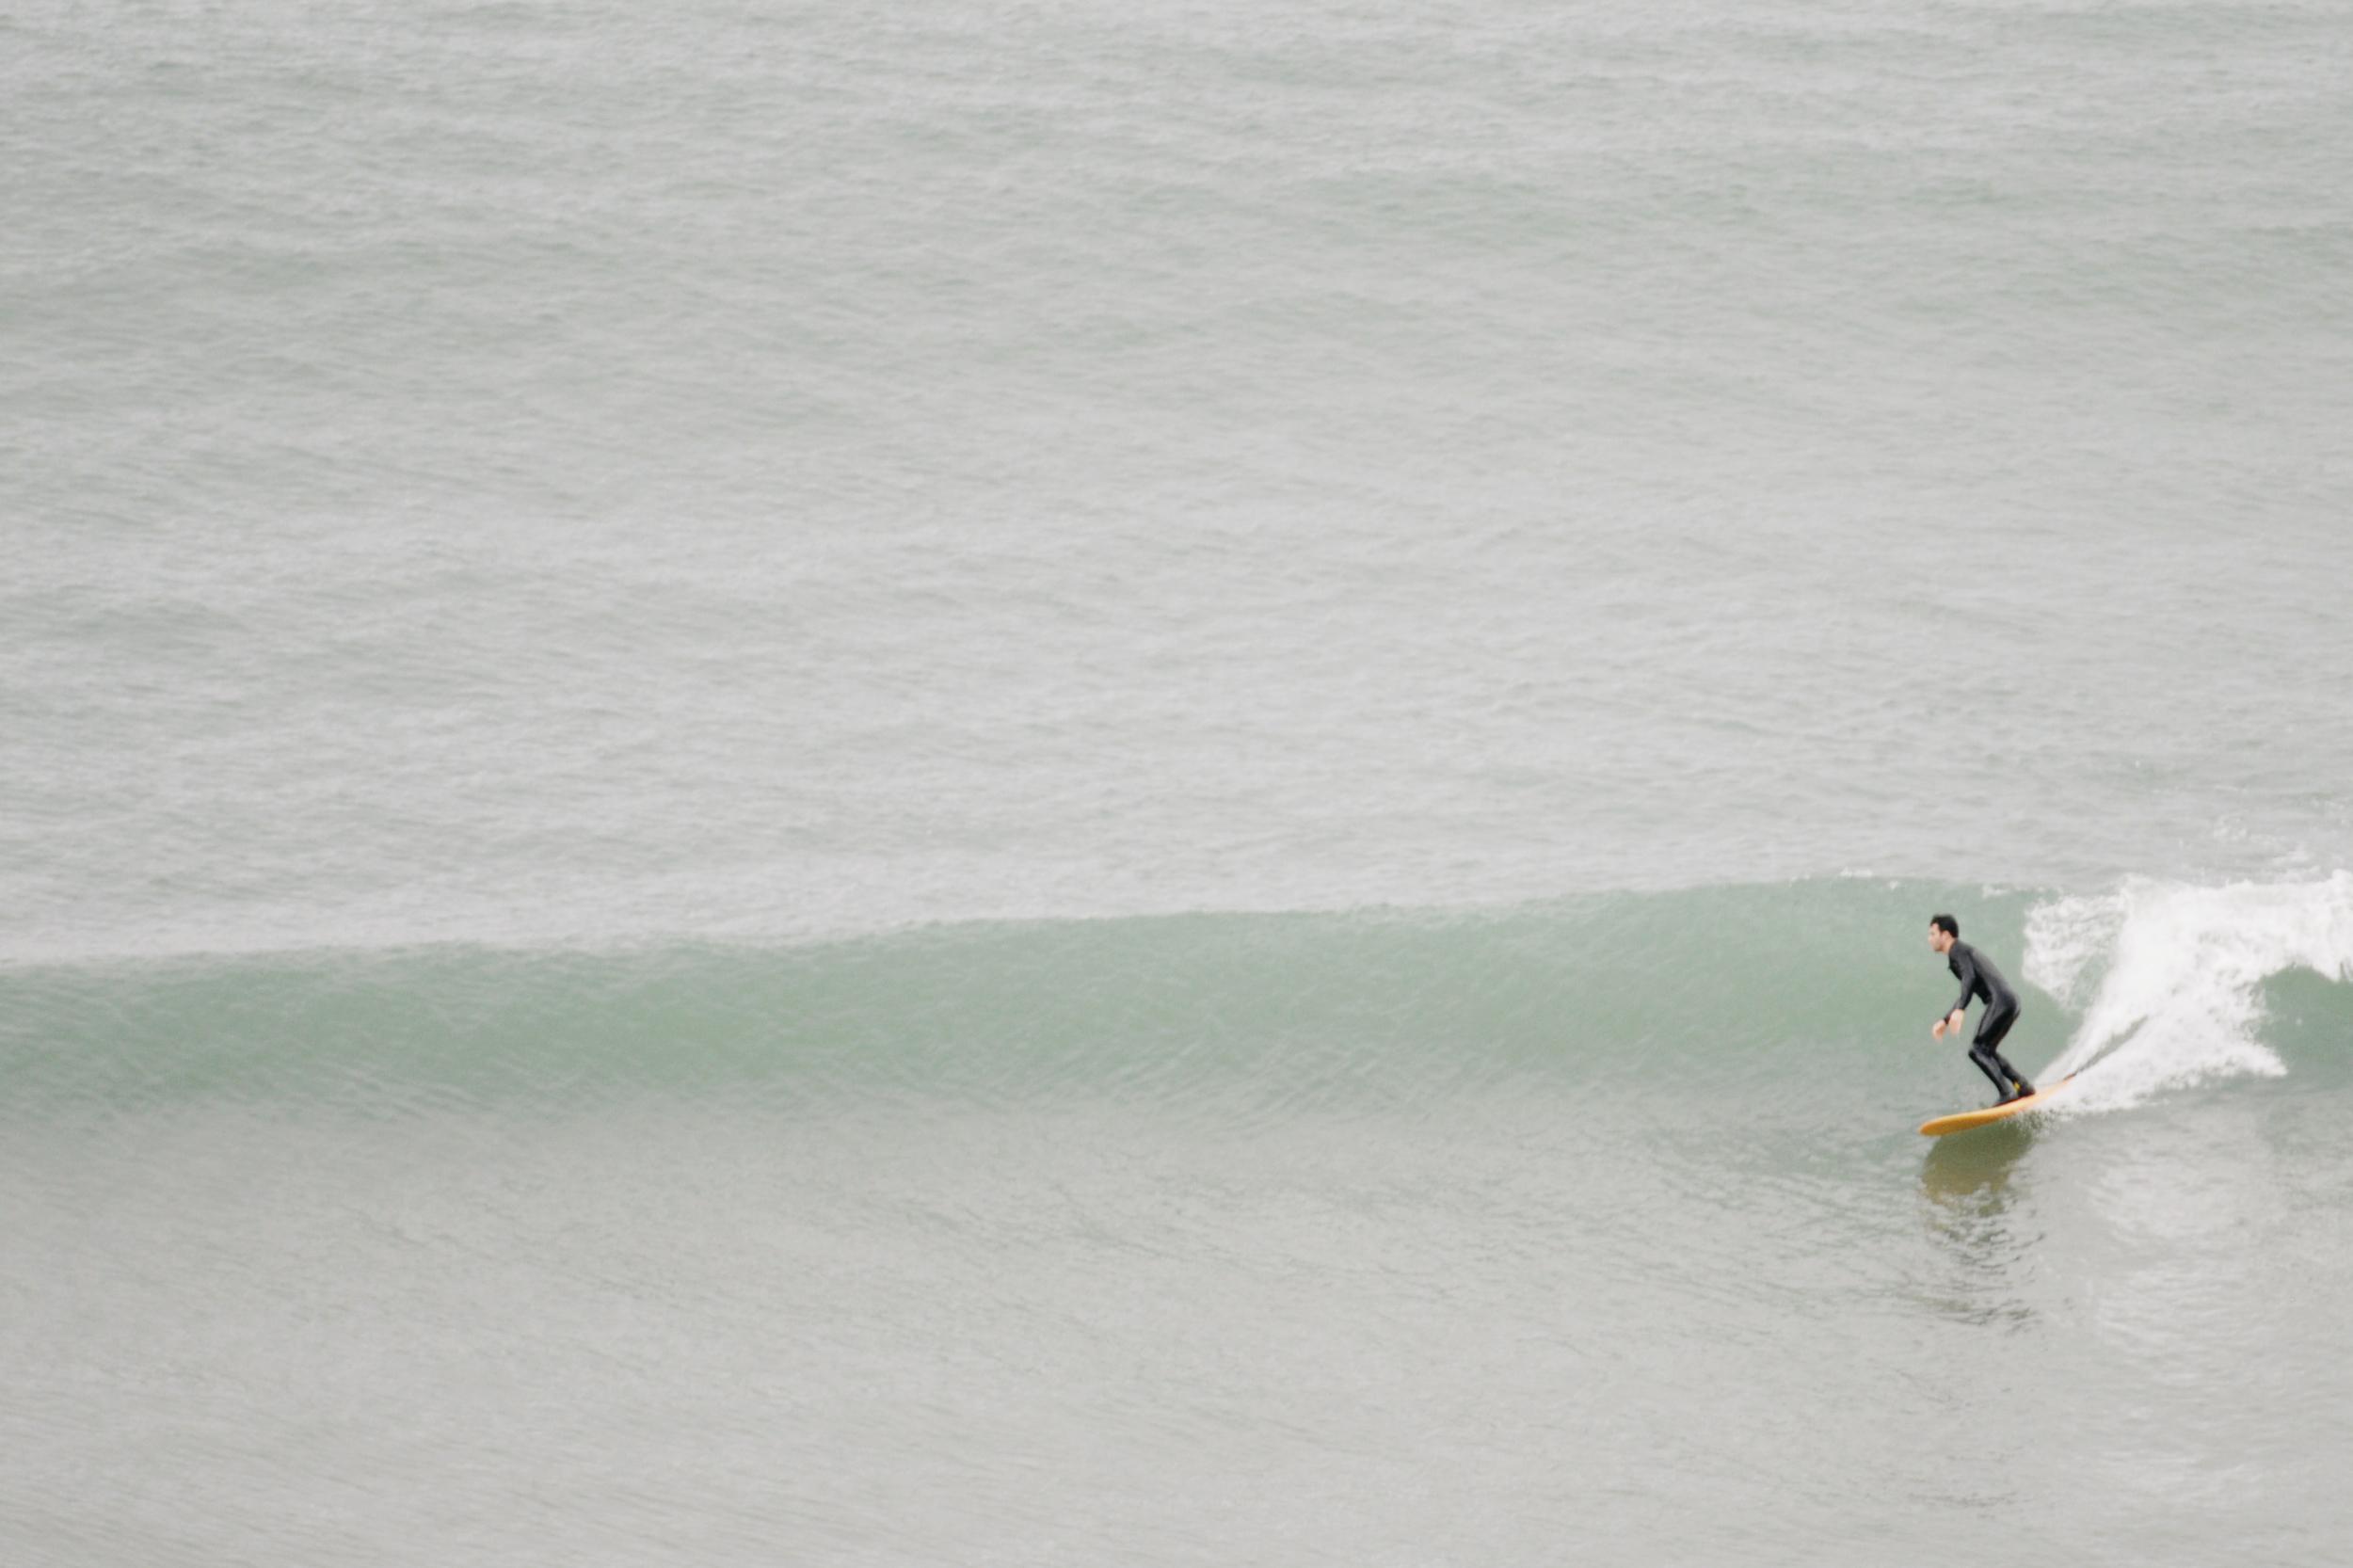 AW_Surf11a.jpg